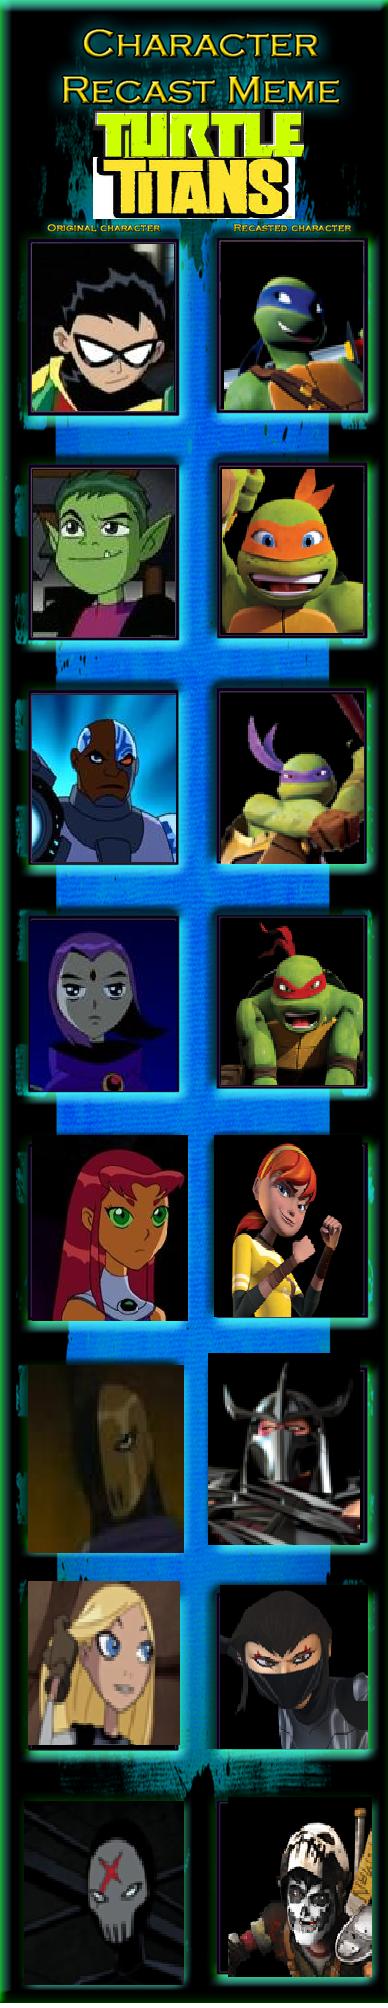 Teen Titans Recast with the Ninja Turtles